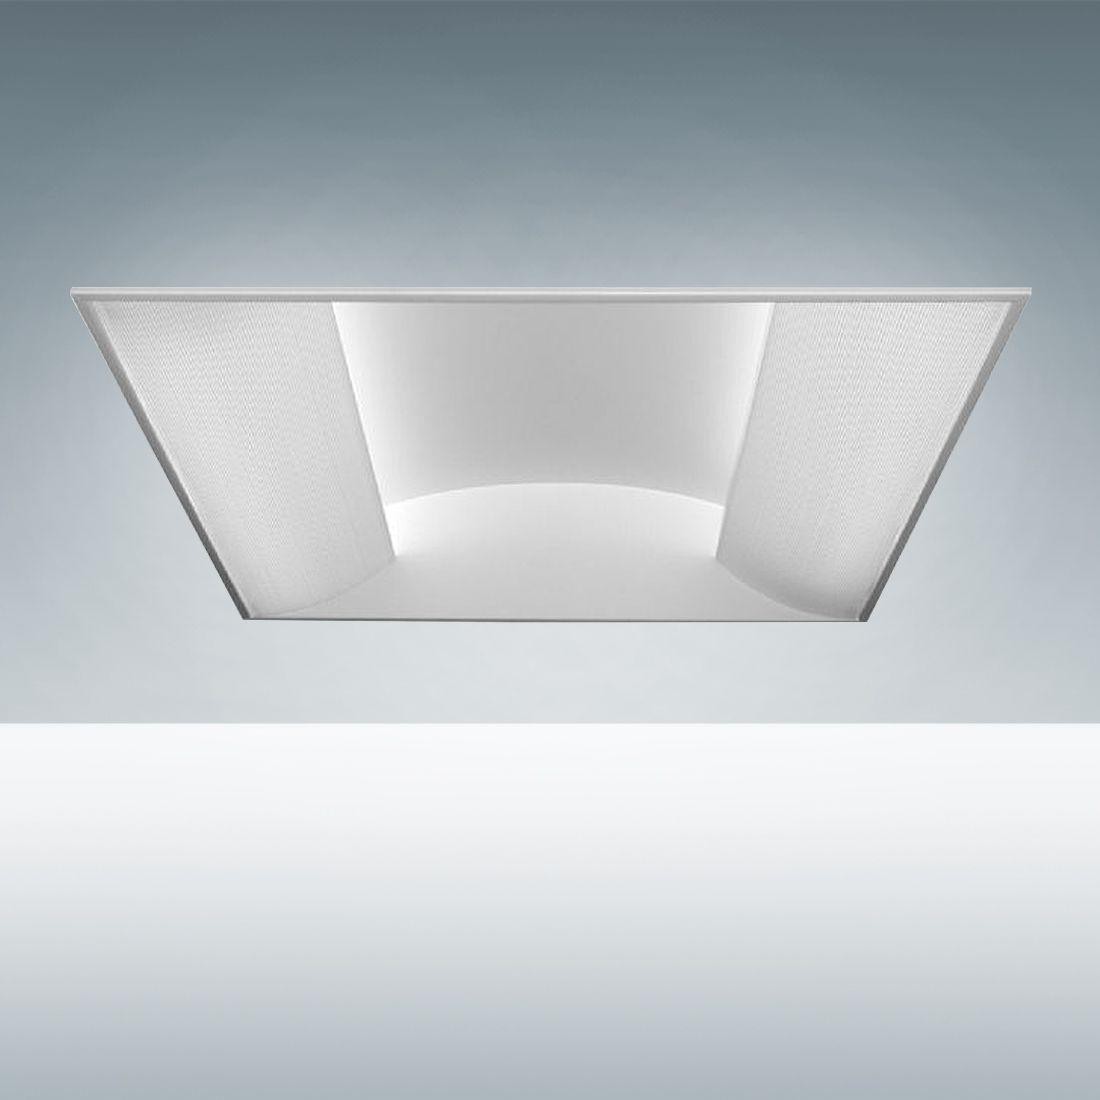 alcon lighting 14080 prestige architectural led recessed side basket direct light troffer